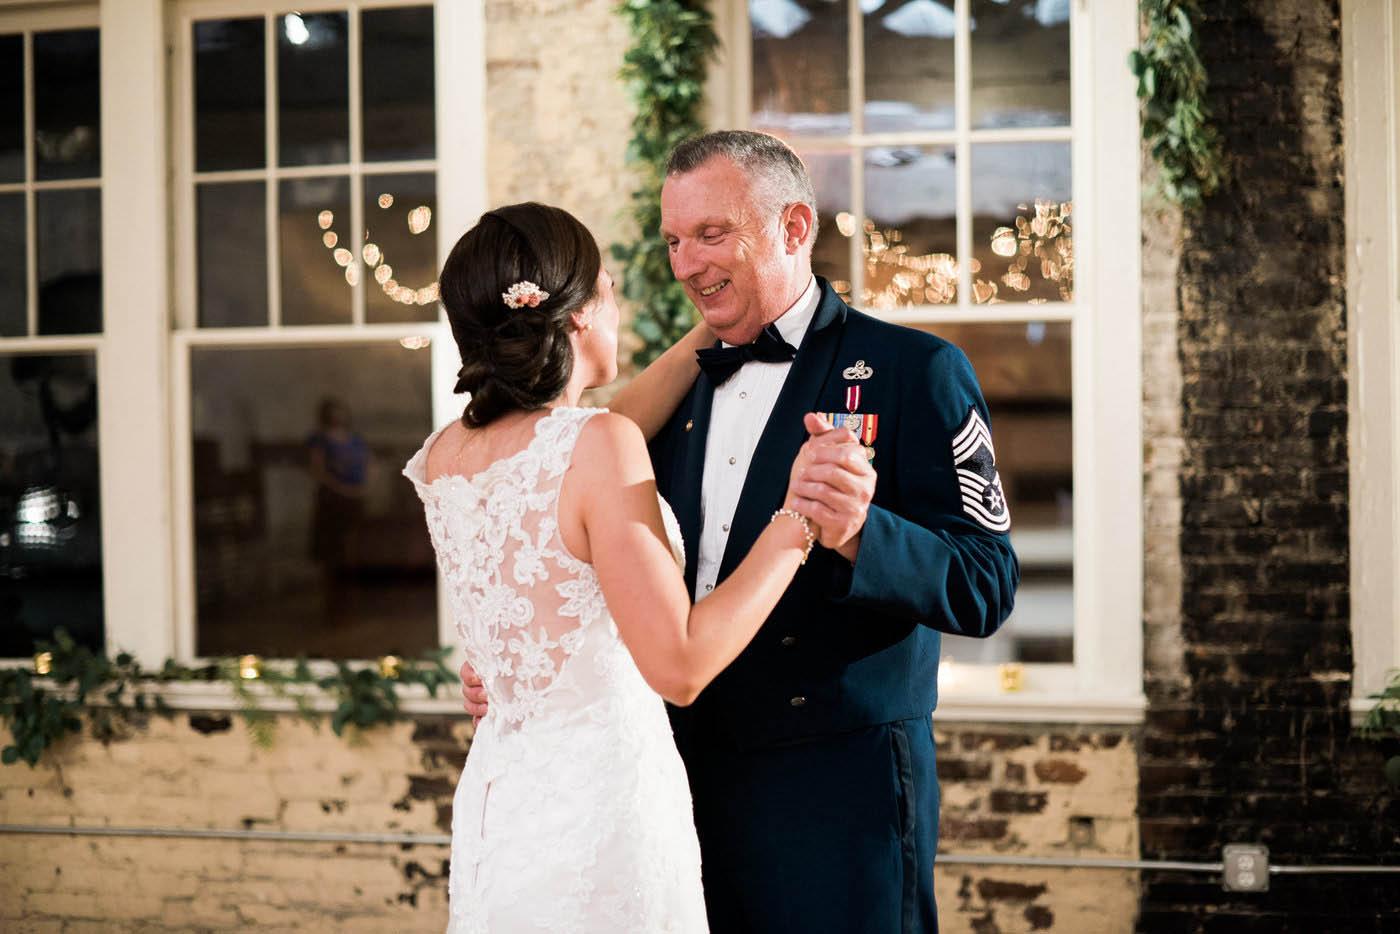 stockroom-at-230-wedding-14.jpg